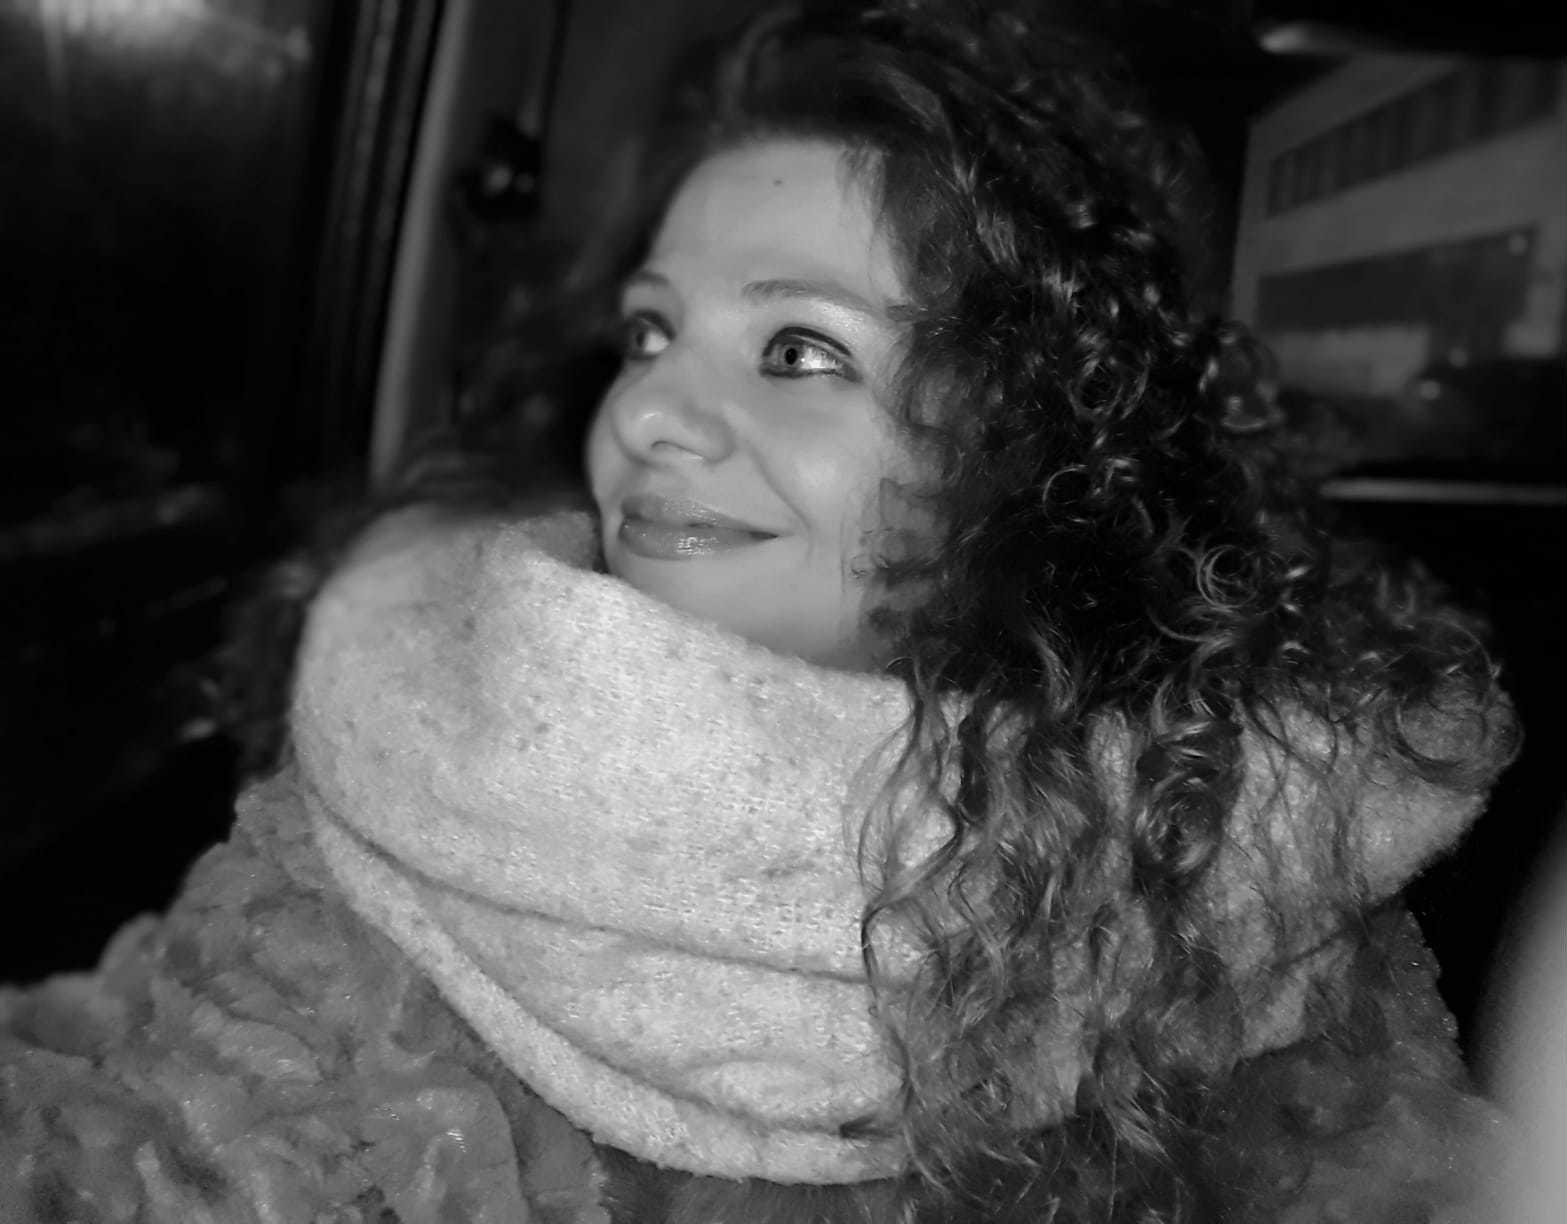 Myriam Russo